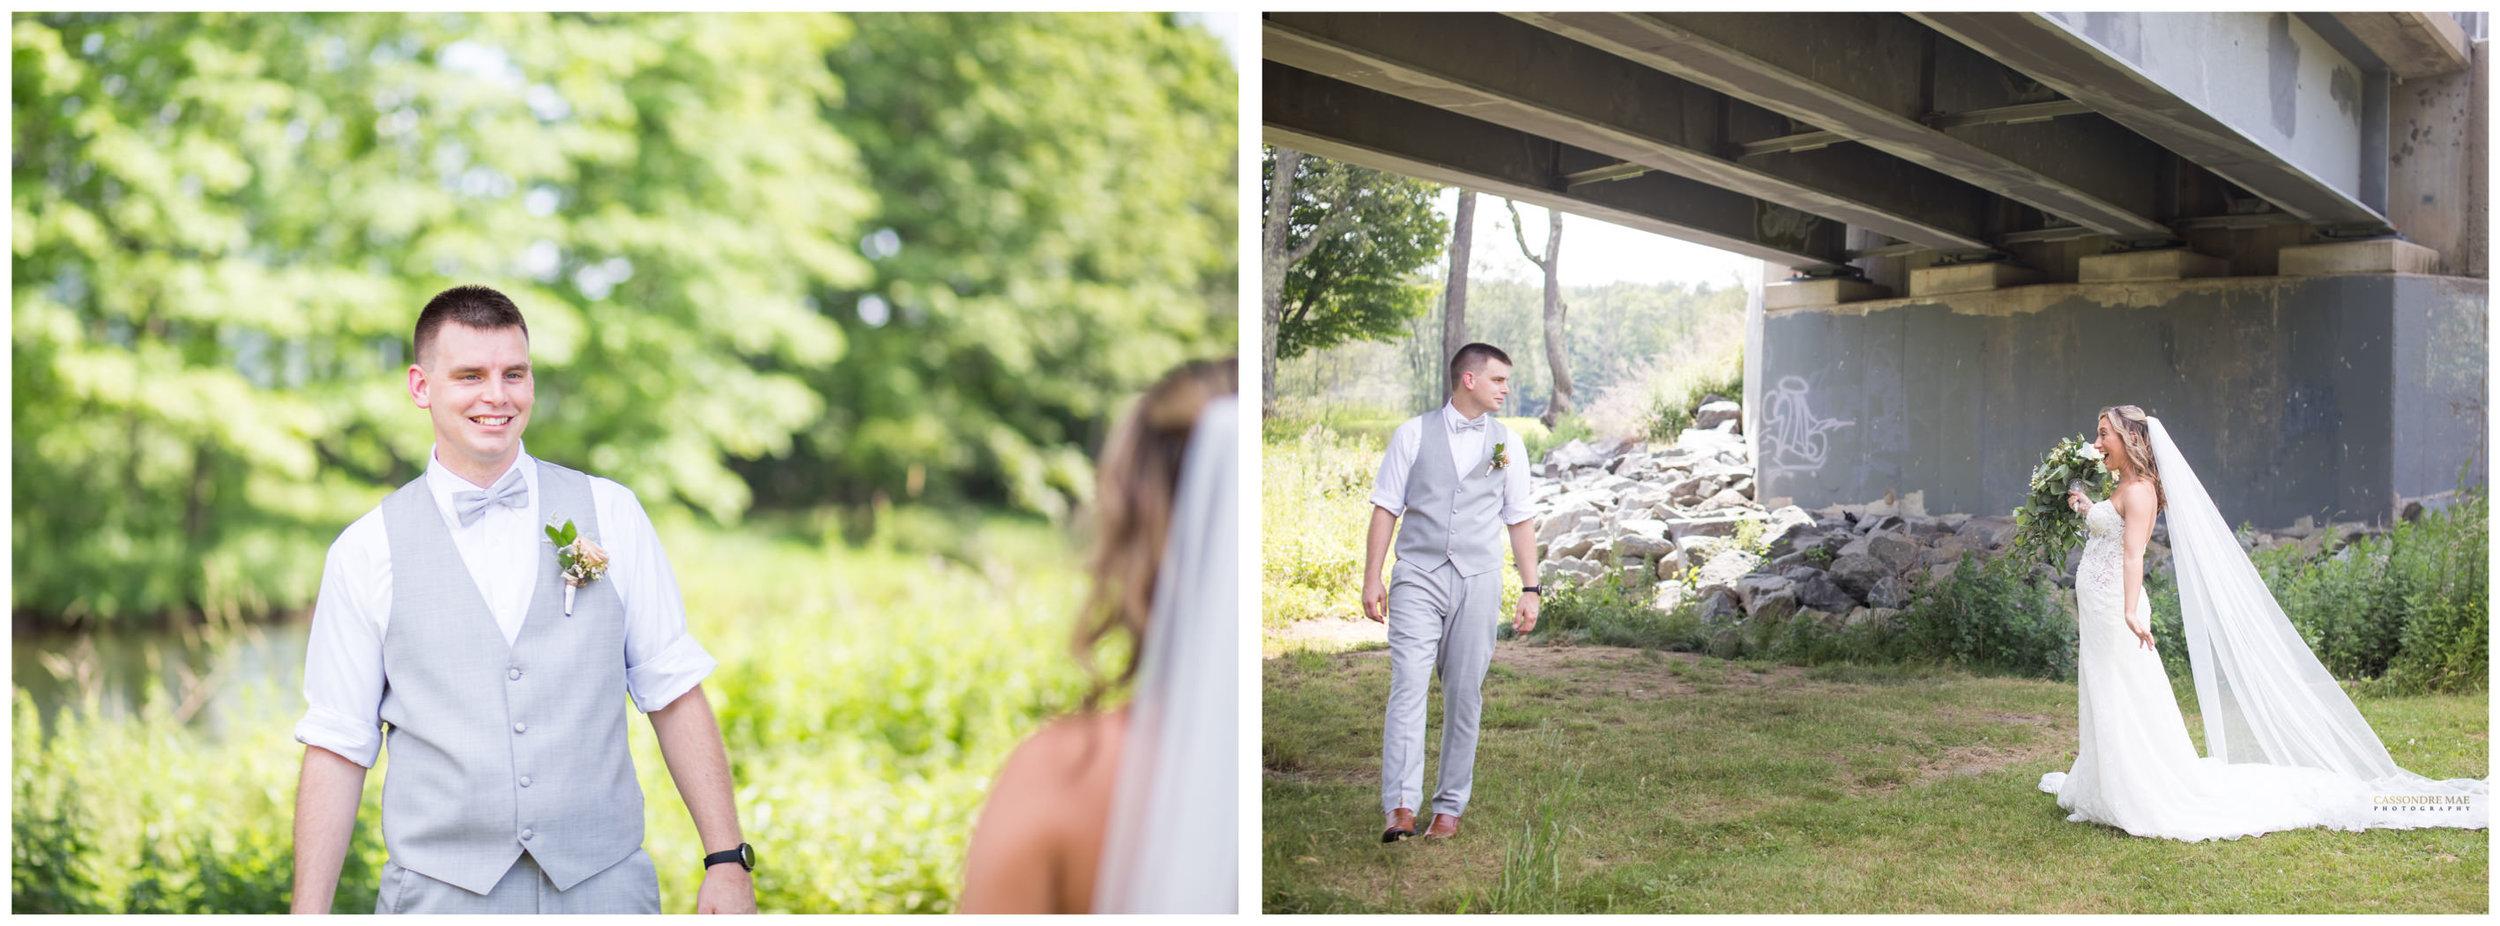 Cassondre Mae Photography Hudson Valley Wedding 9.jpg